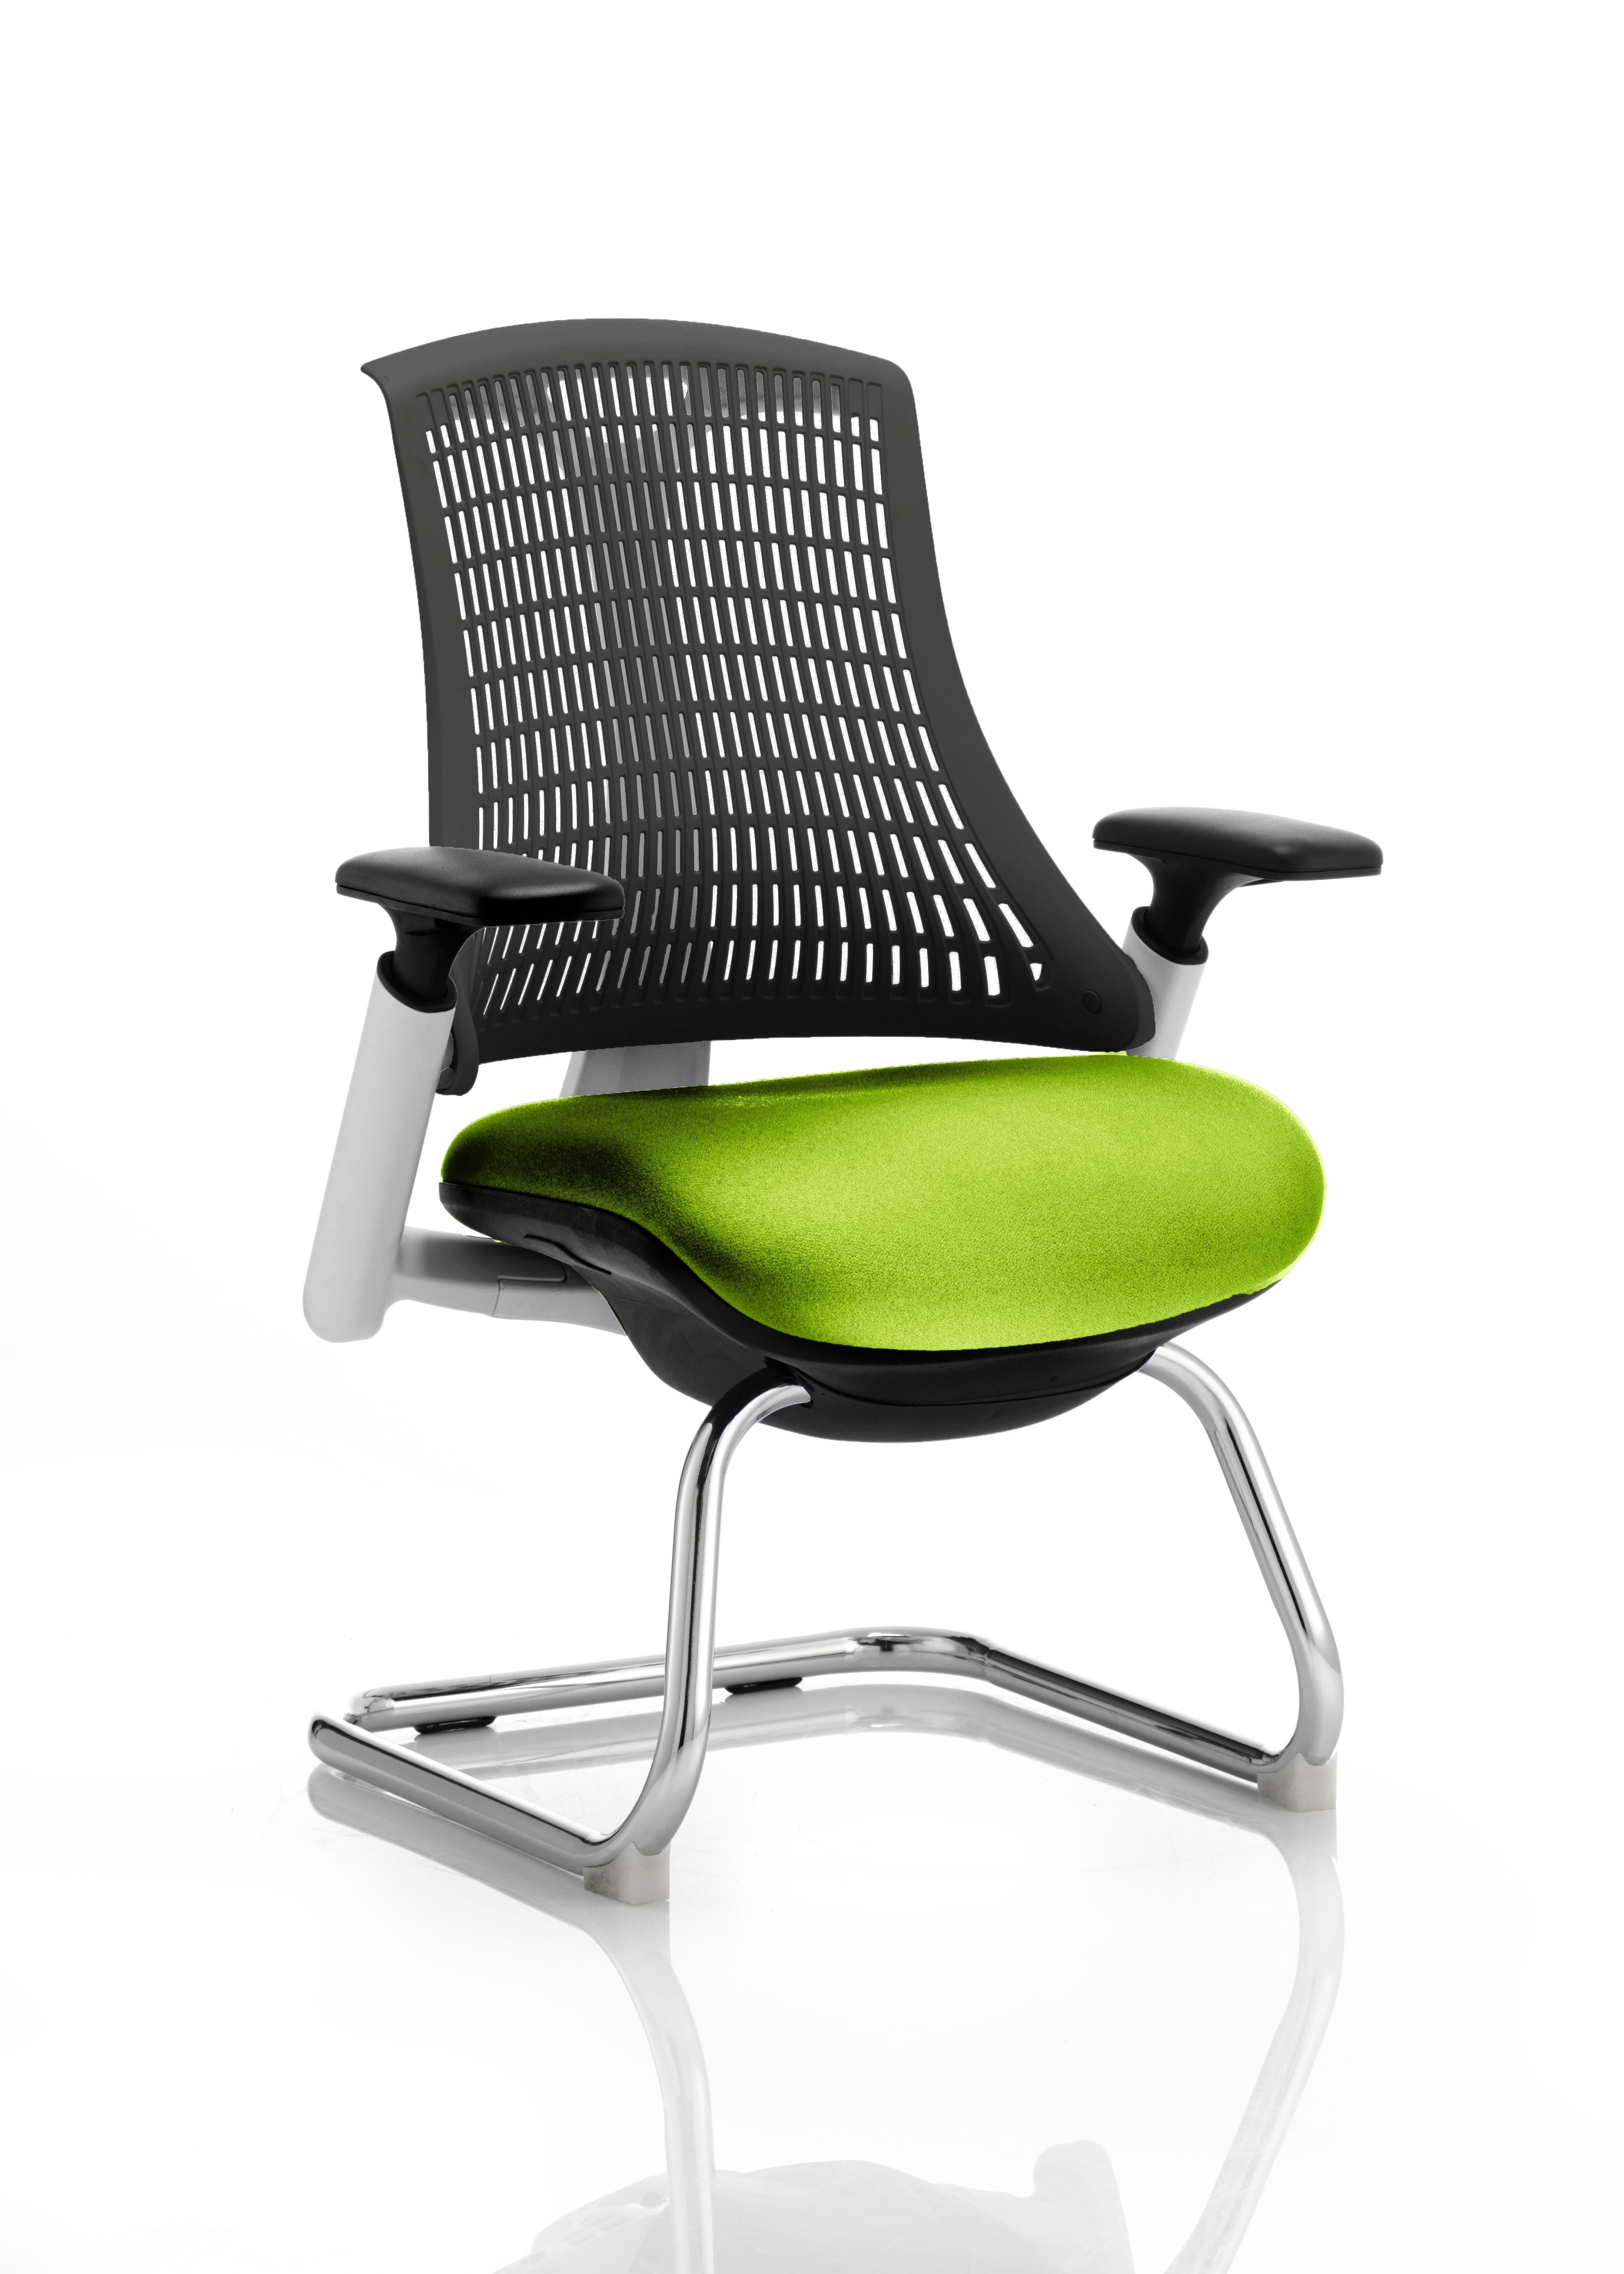 Flex Cantilever Chair White Frame Black Back Bespoke Colour Seat Myrrh Green